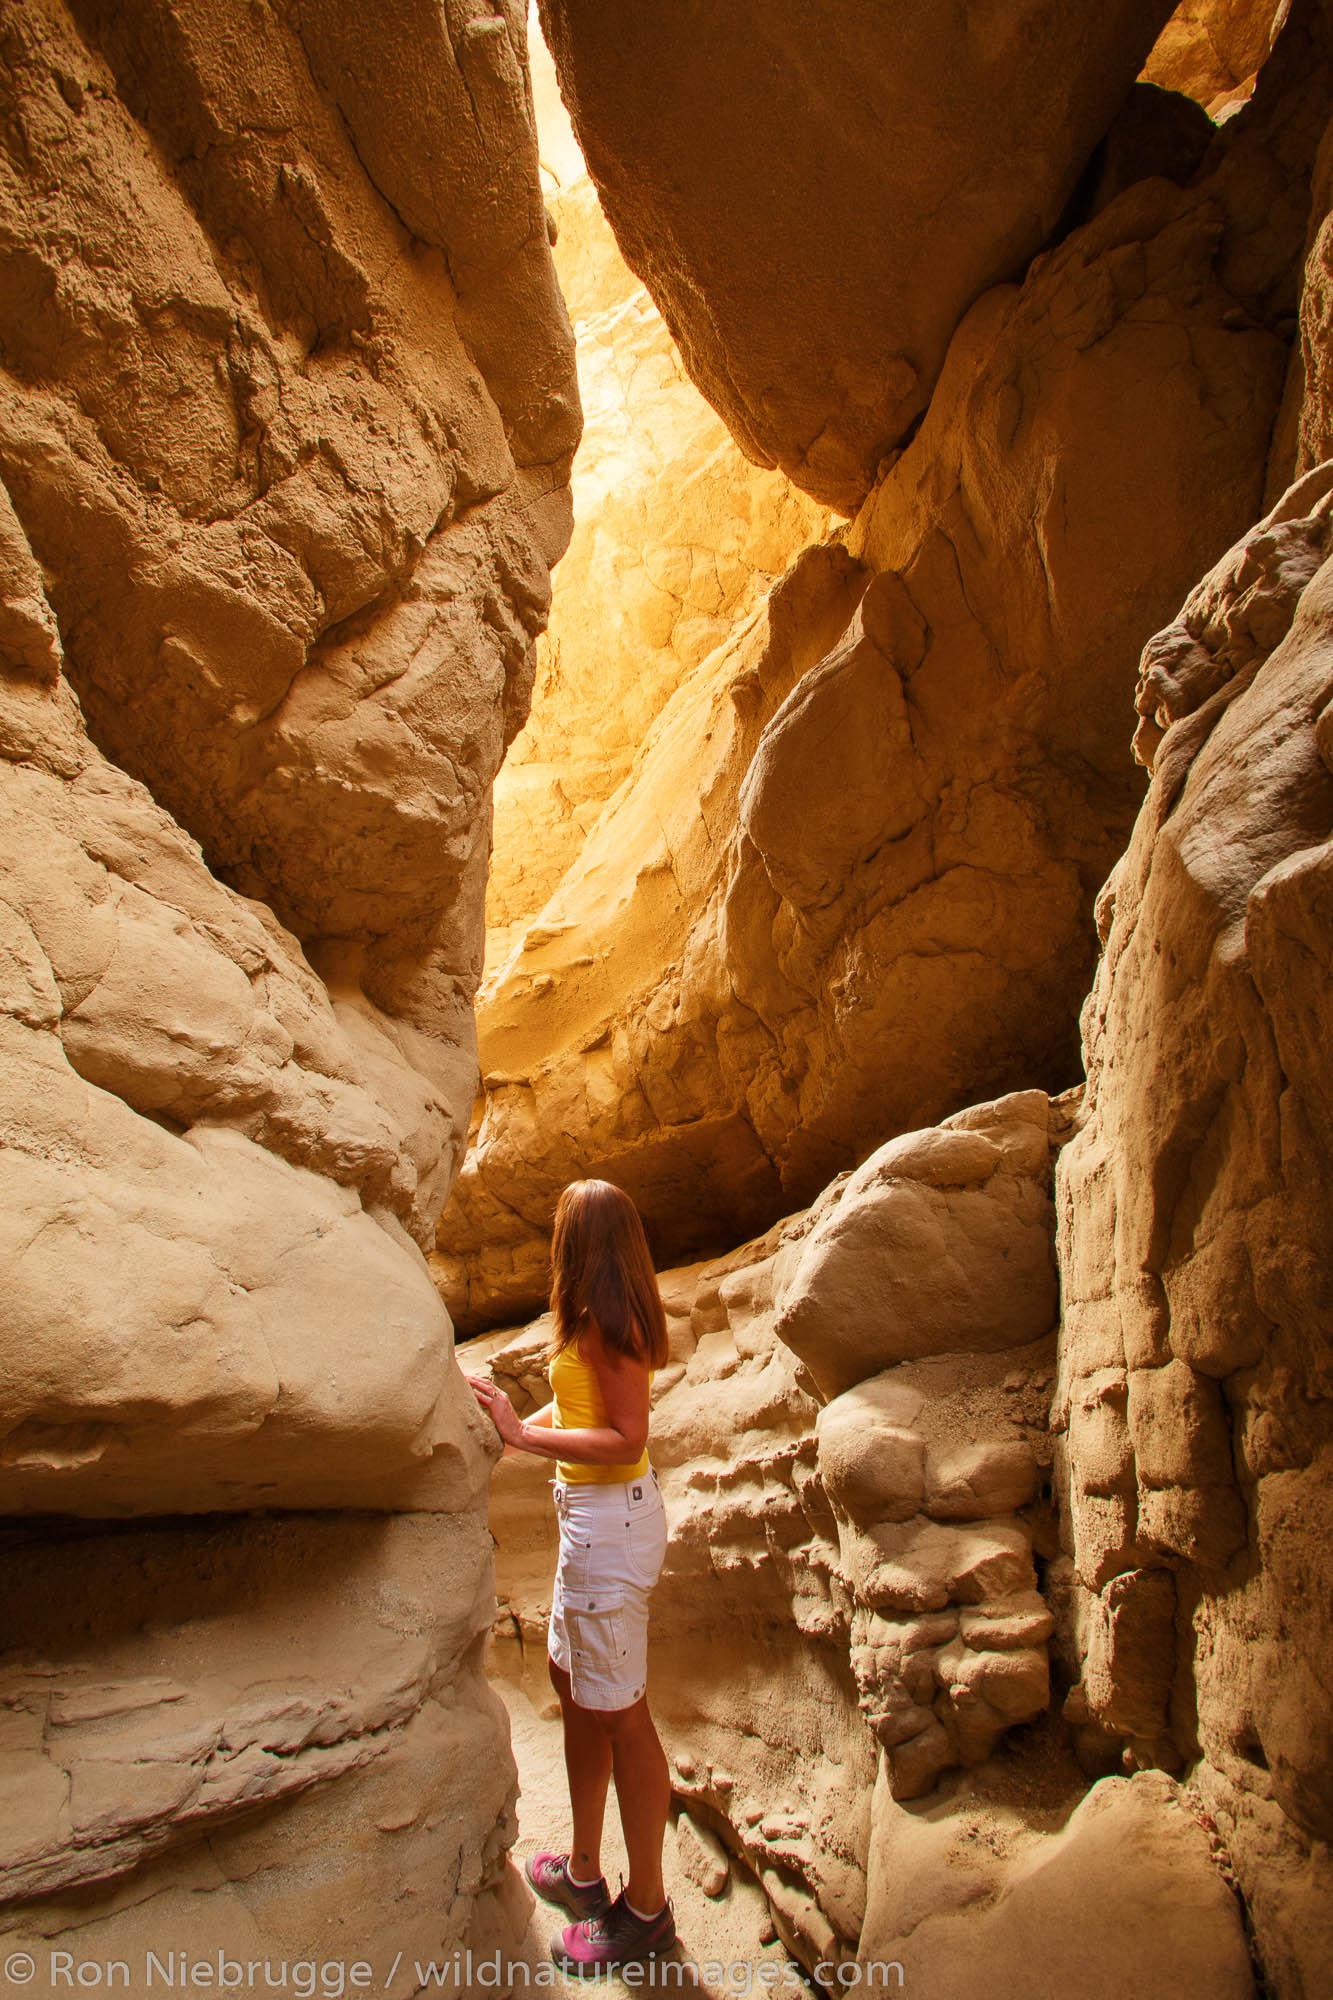 A visitor explores a slot canyon in Anza-Borrego Desert State Park, California. (model released)